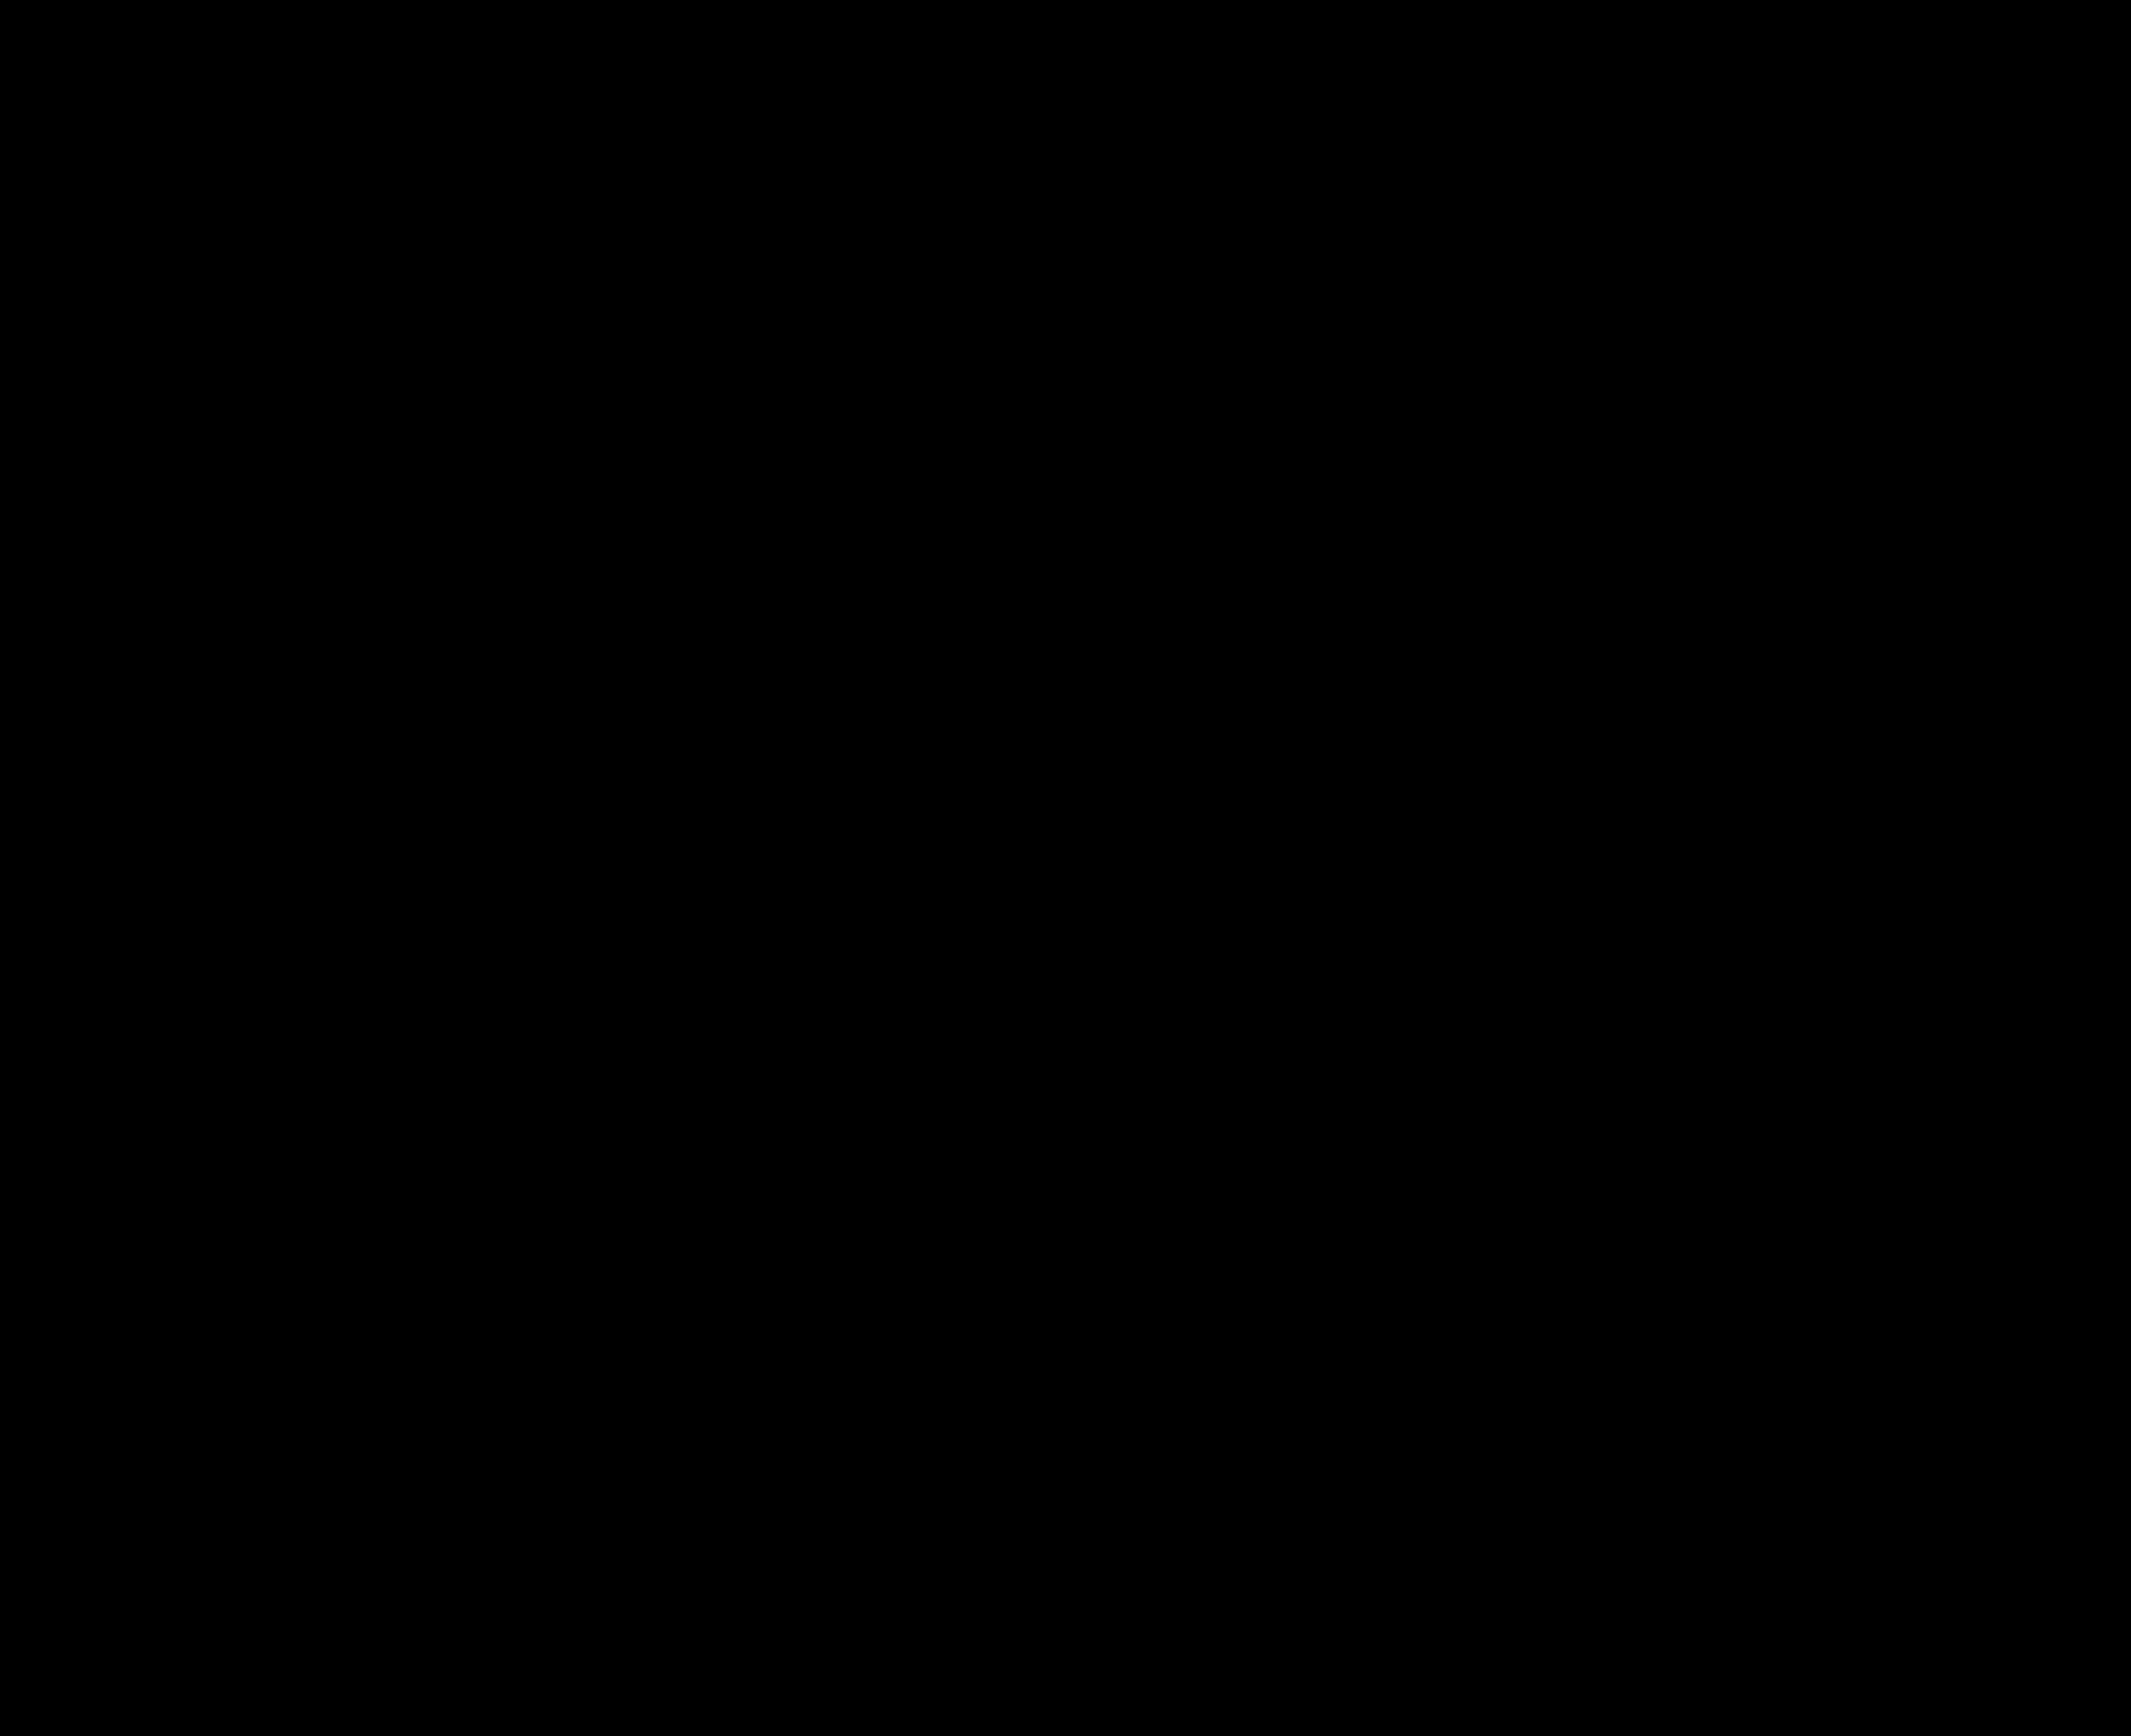 Farmhouse silhouette clipart